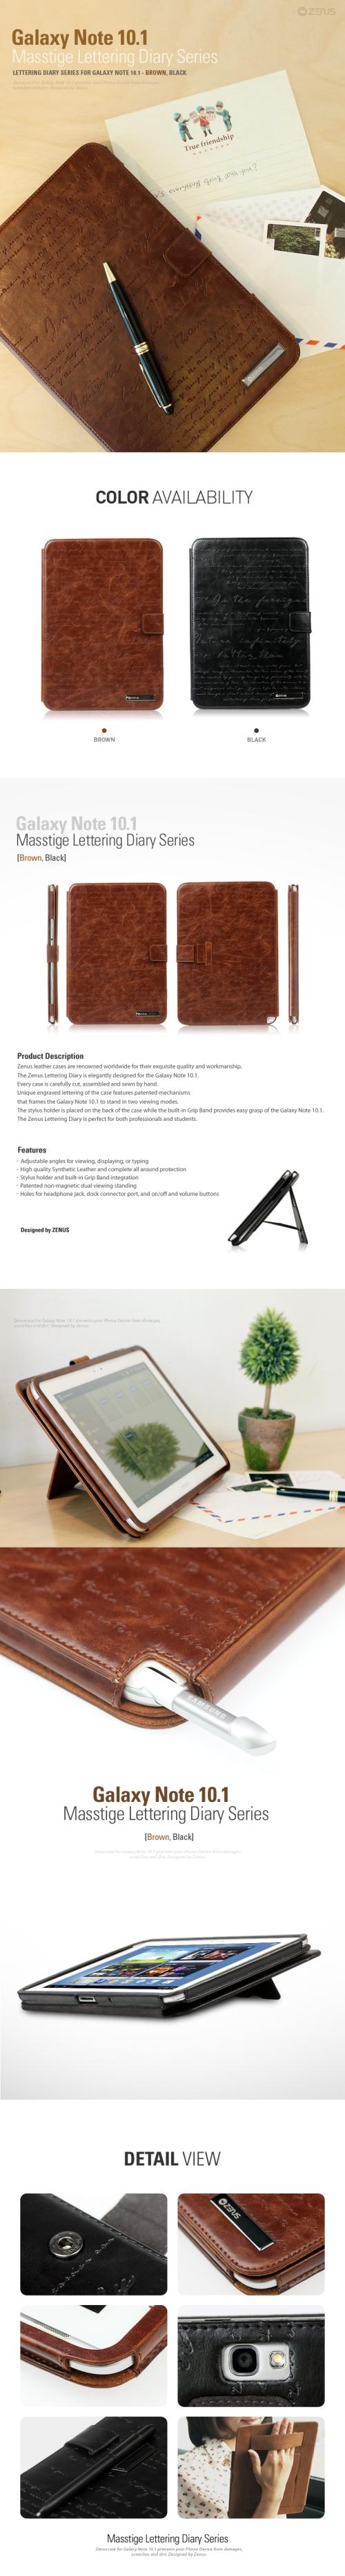 Zenus Galaxy Note 10.1 Masstige Lettering Diary Series